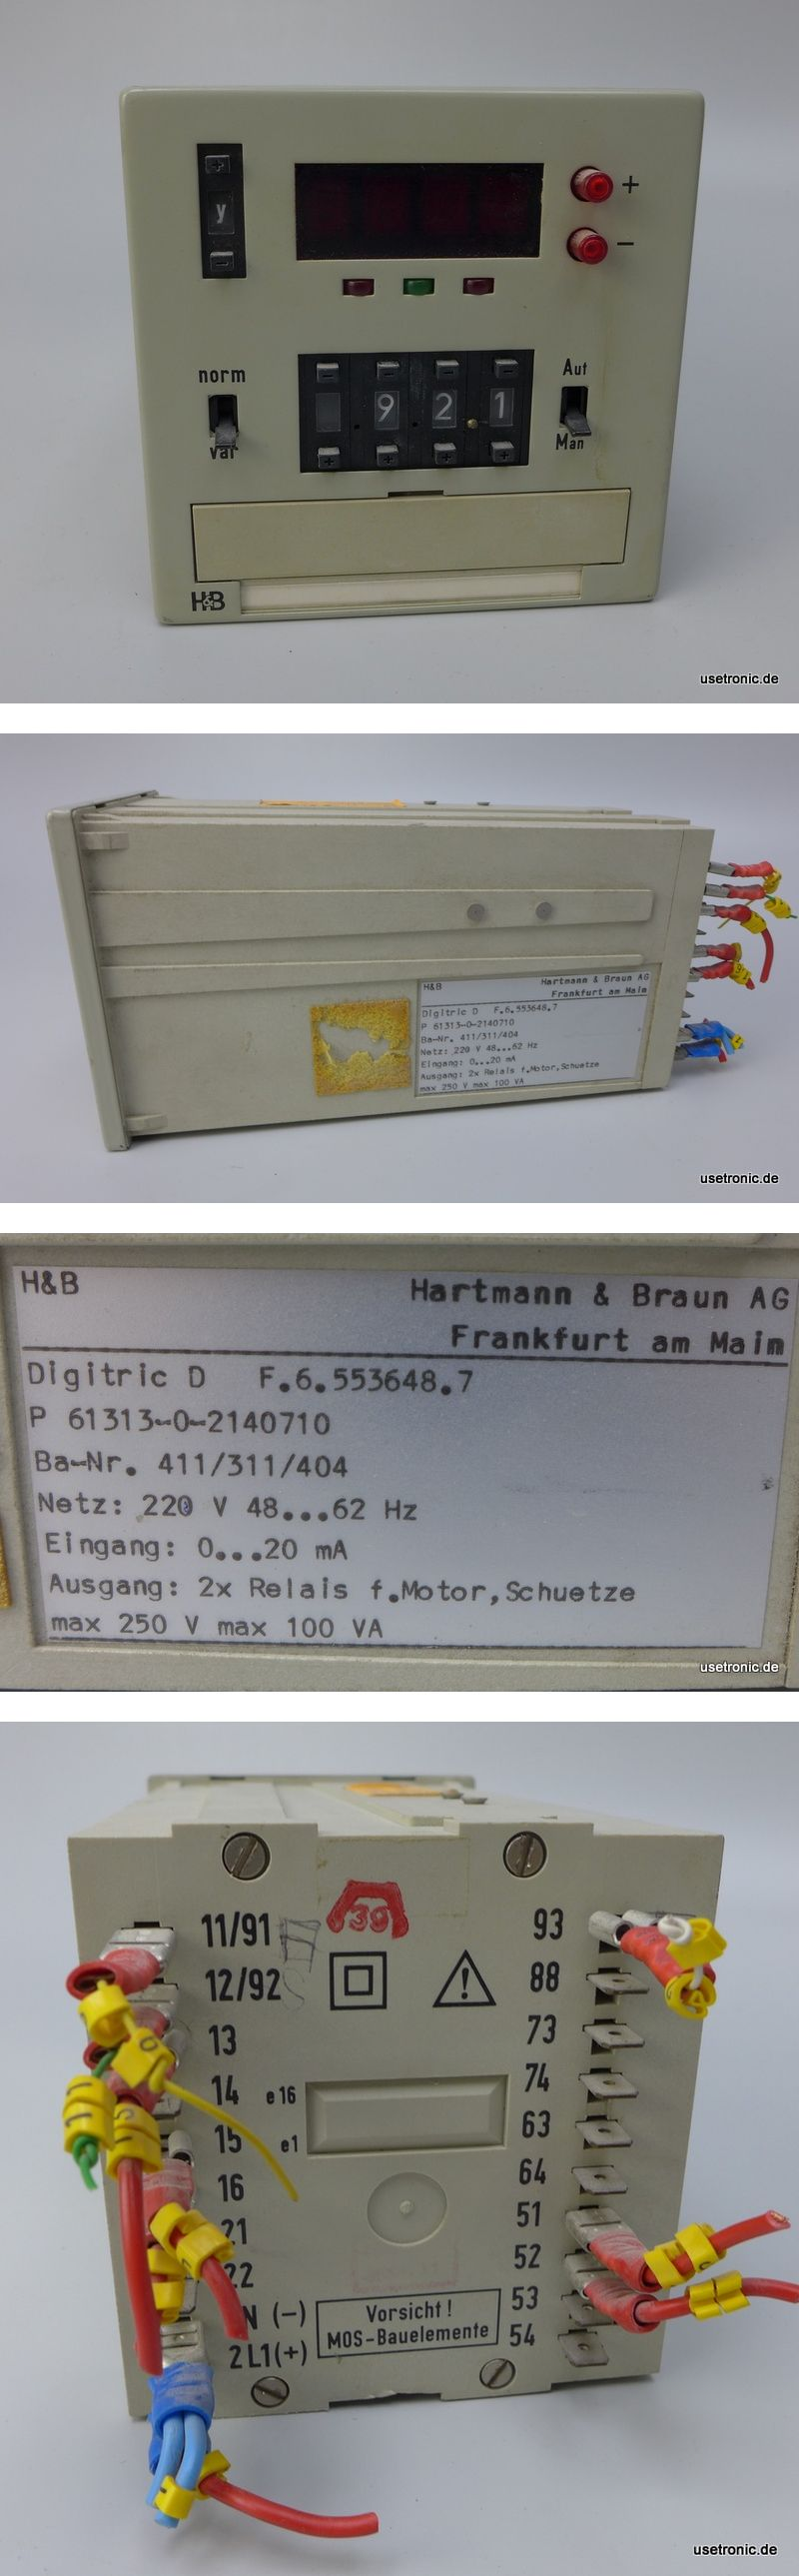 Hartmann Braun Digitric D F.6.553648.7